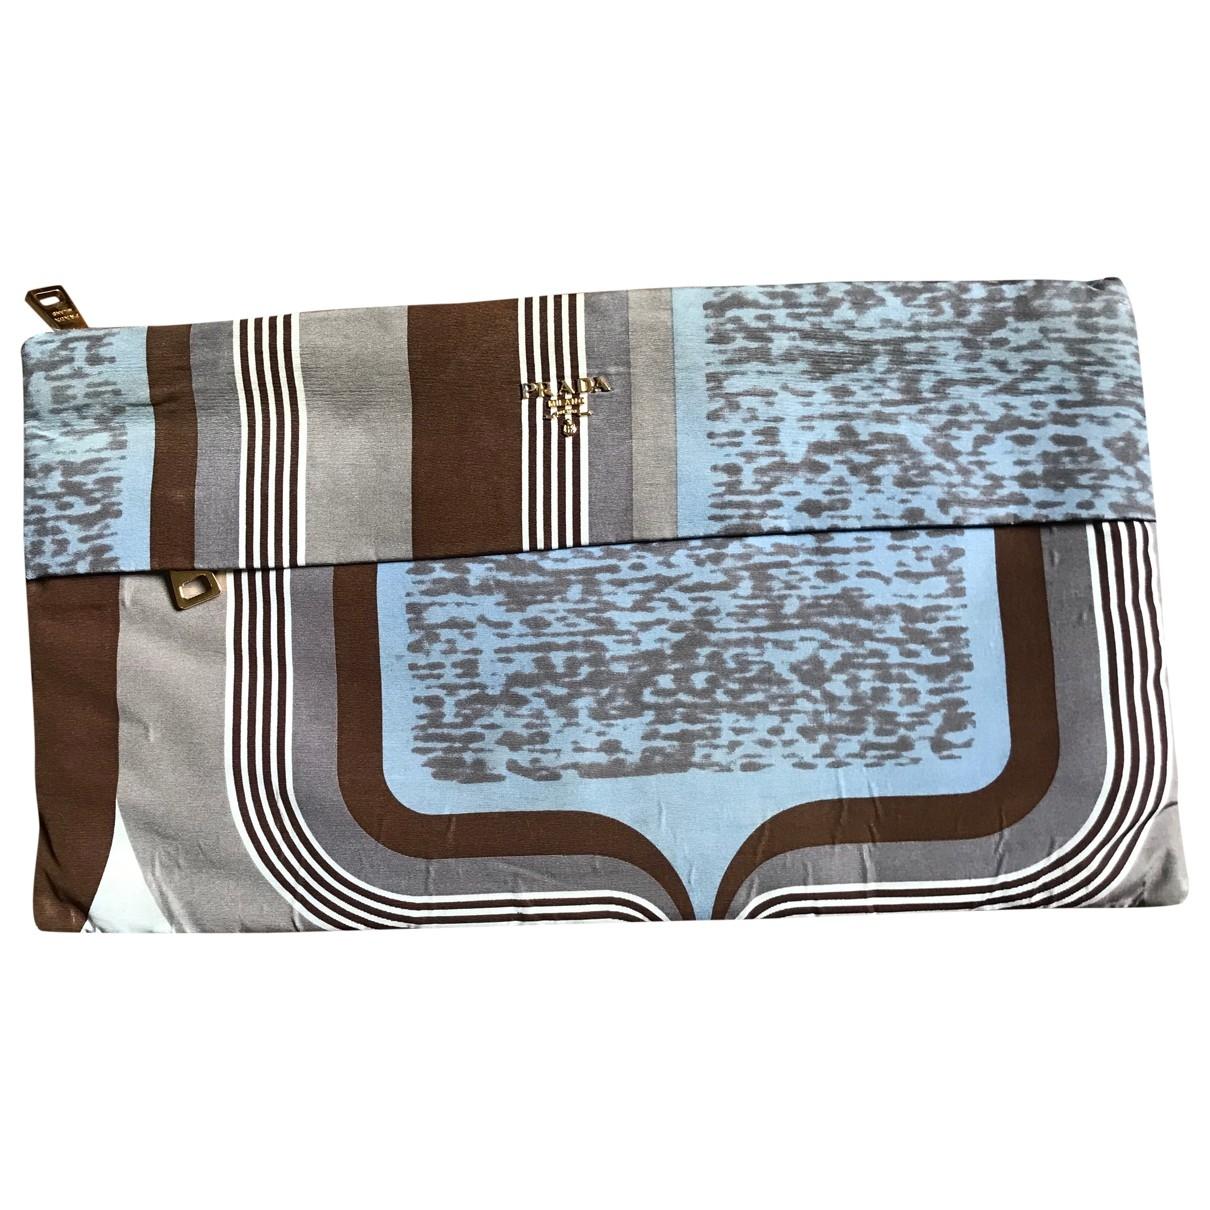 Prada \N Multicolour Clutch bag for Women \N